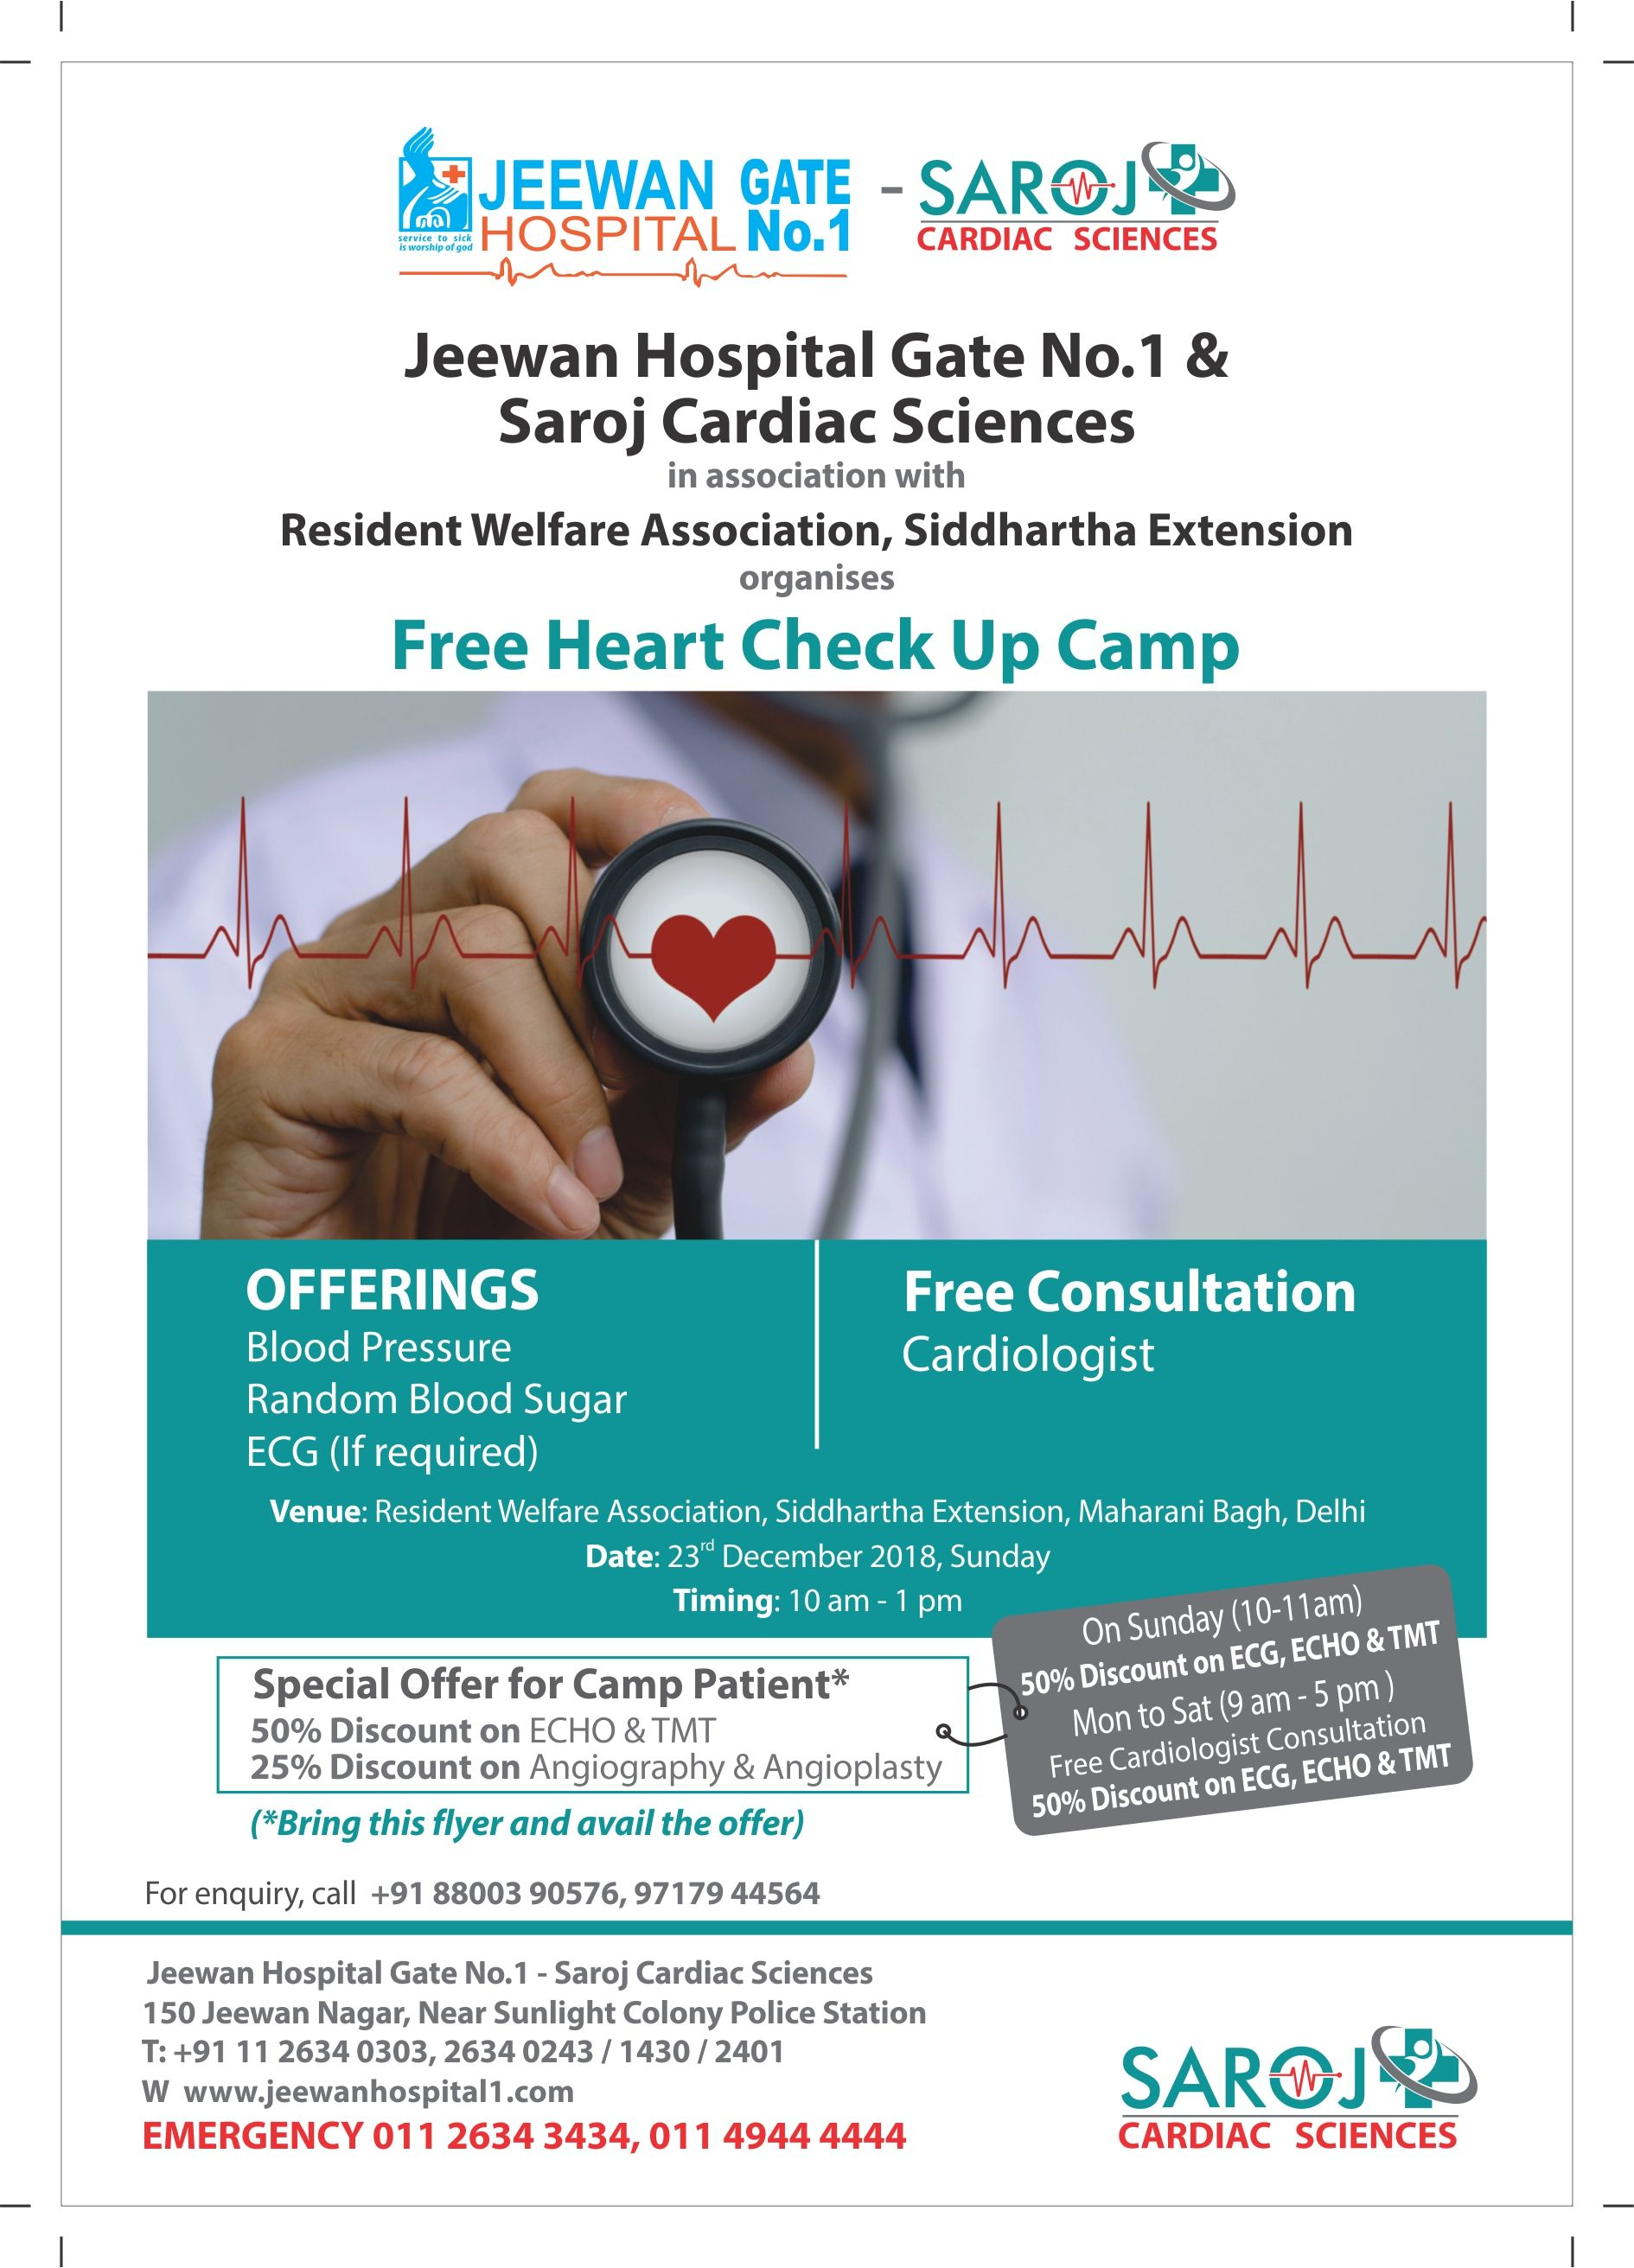 Jeewan hospital gate no 1 saroj cardiac sciences are